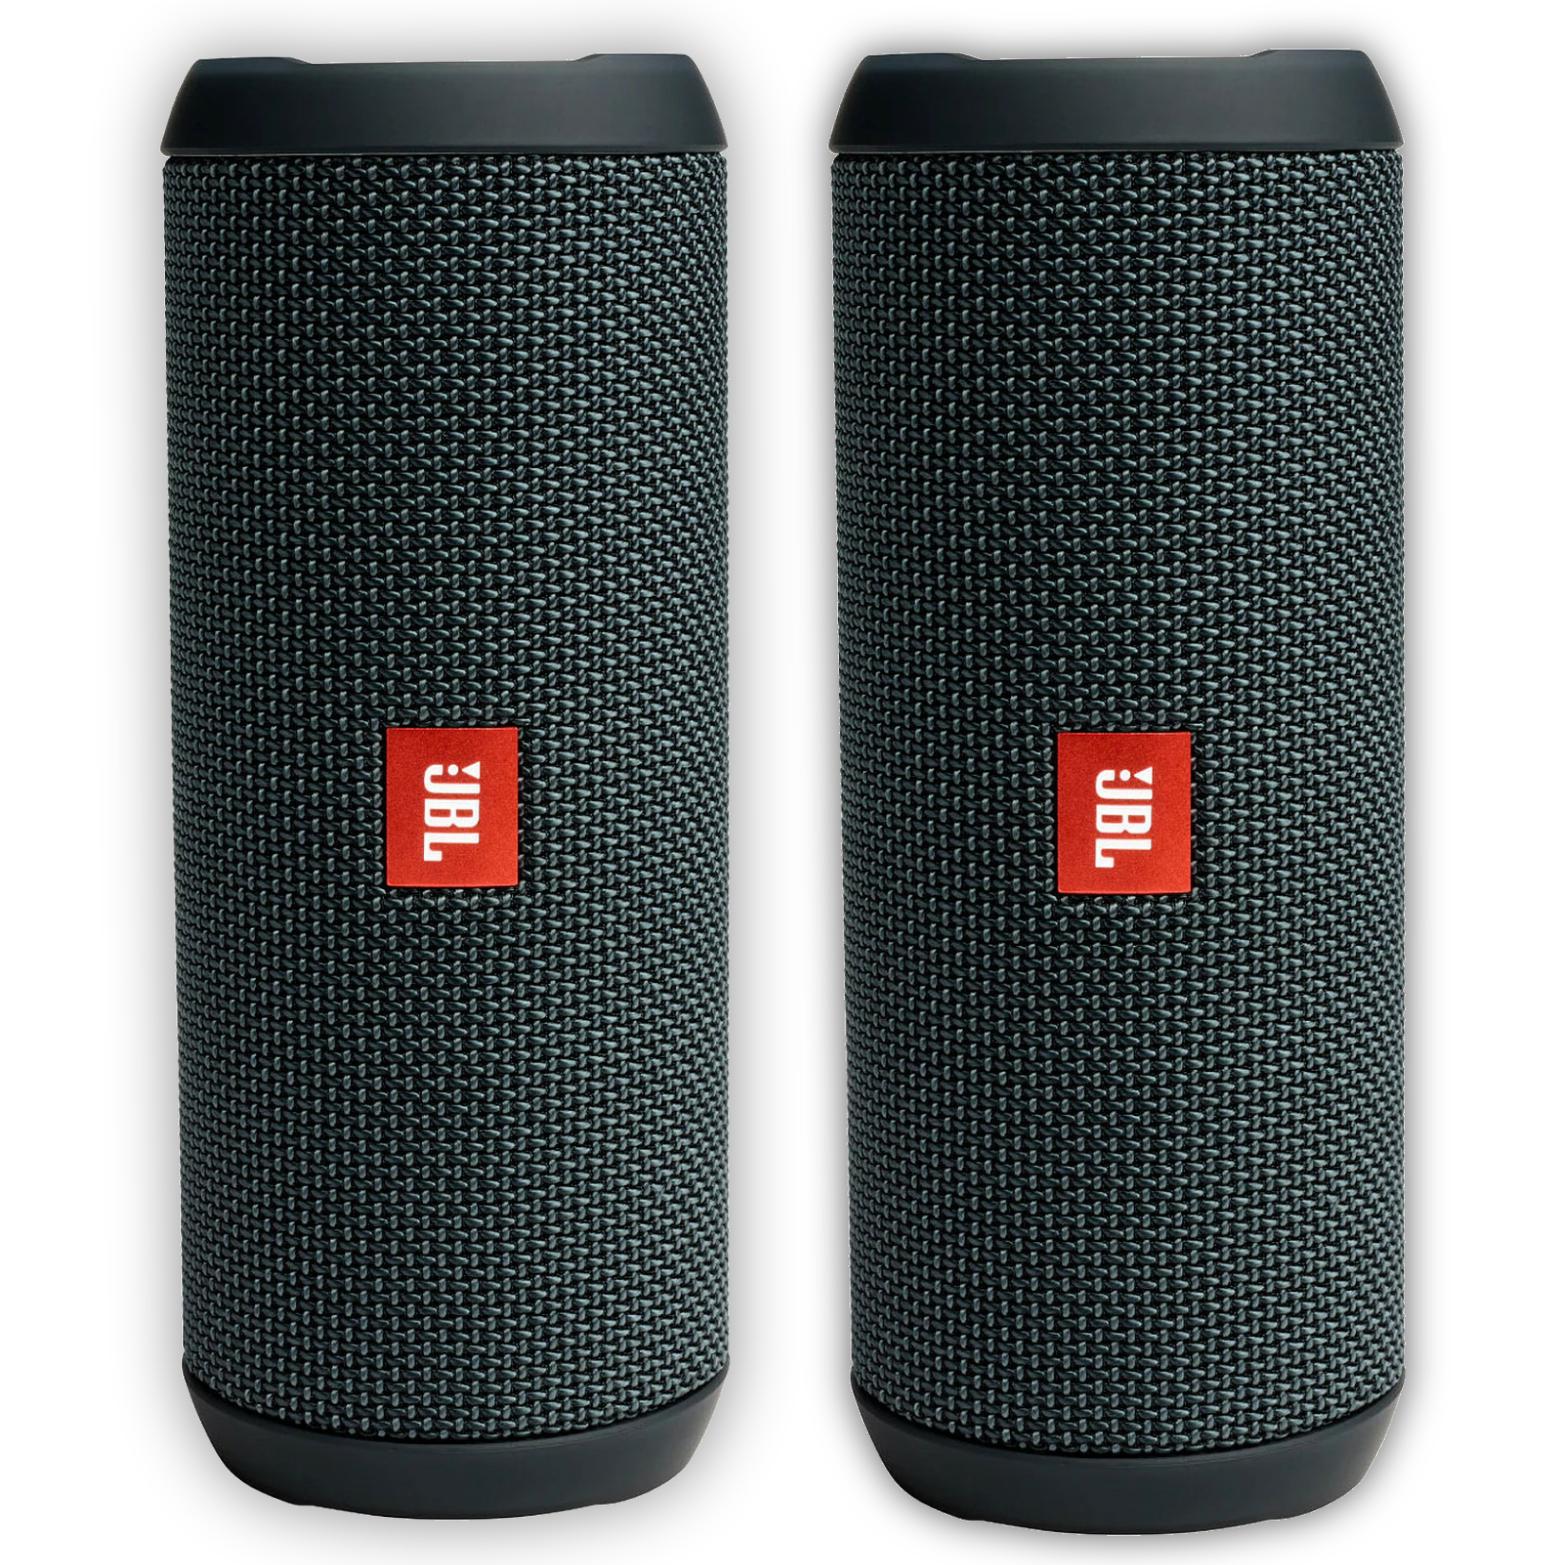 2er Bundle: JBL Flip Essential - Bluetooth Lautsprecher (10h Akku, IPX7 Wasserdicht, 2x 4cm Treiber)